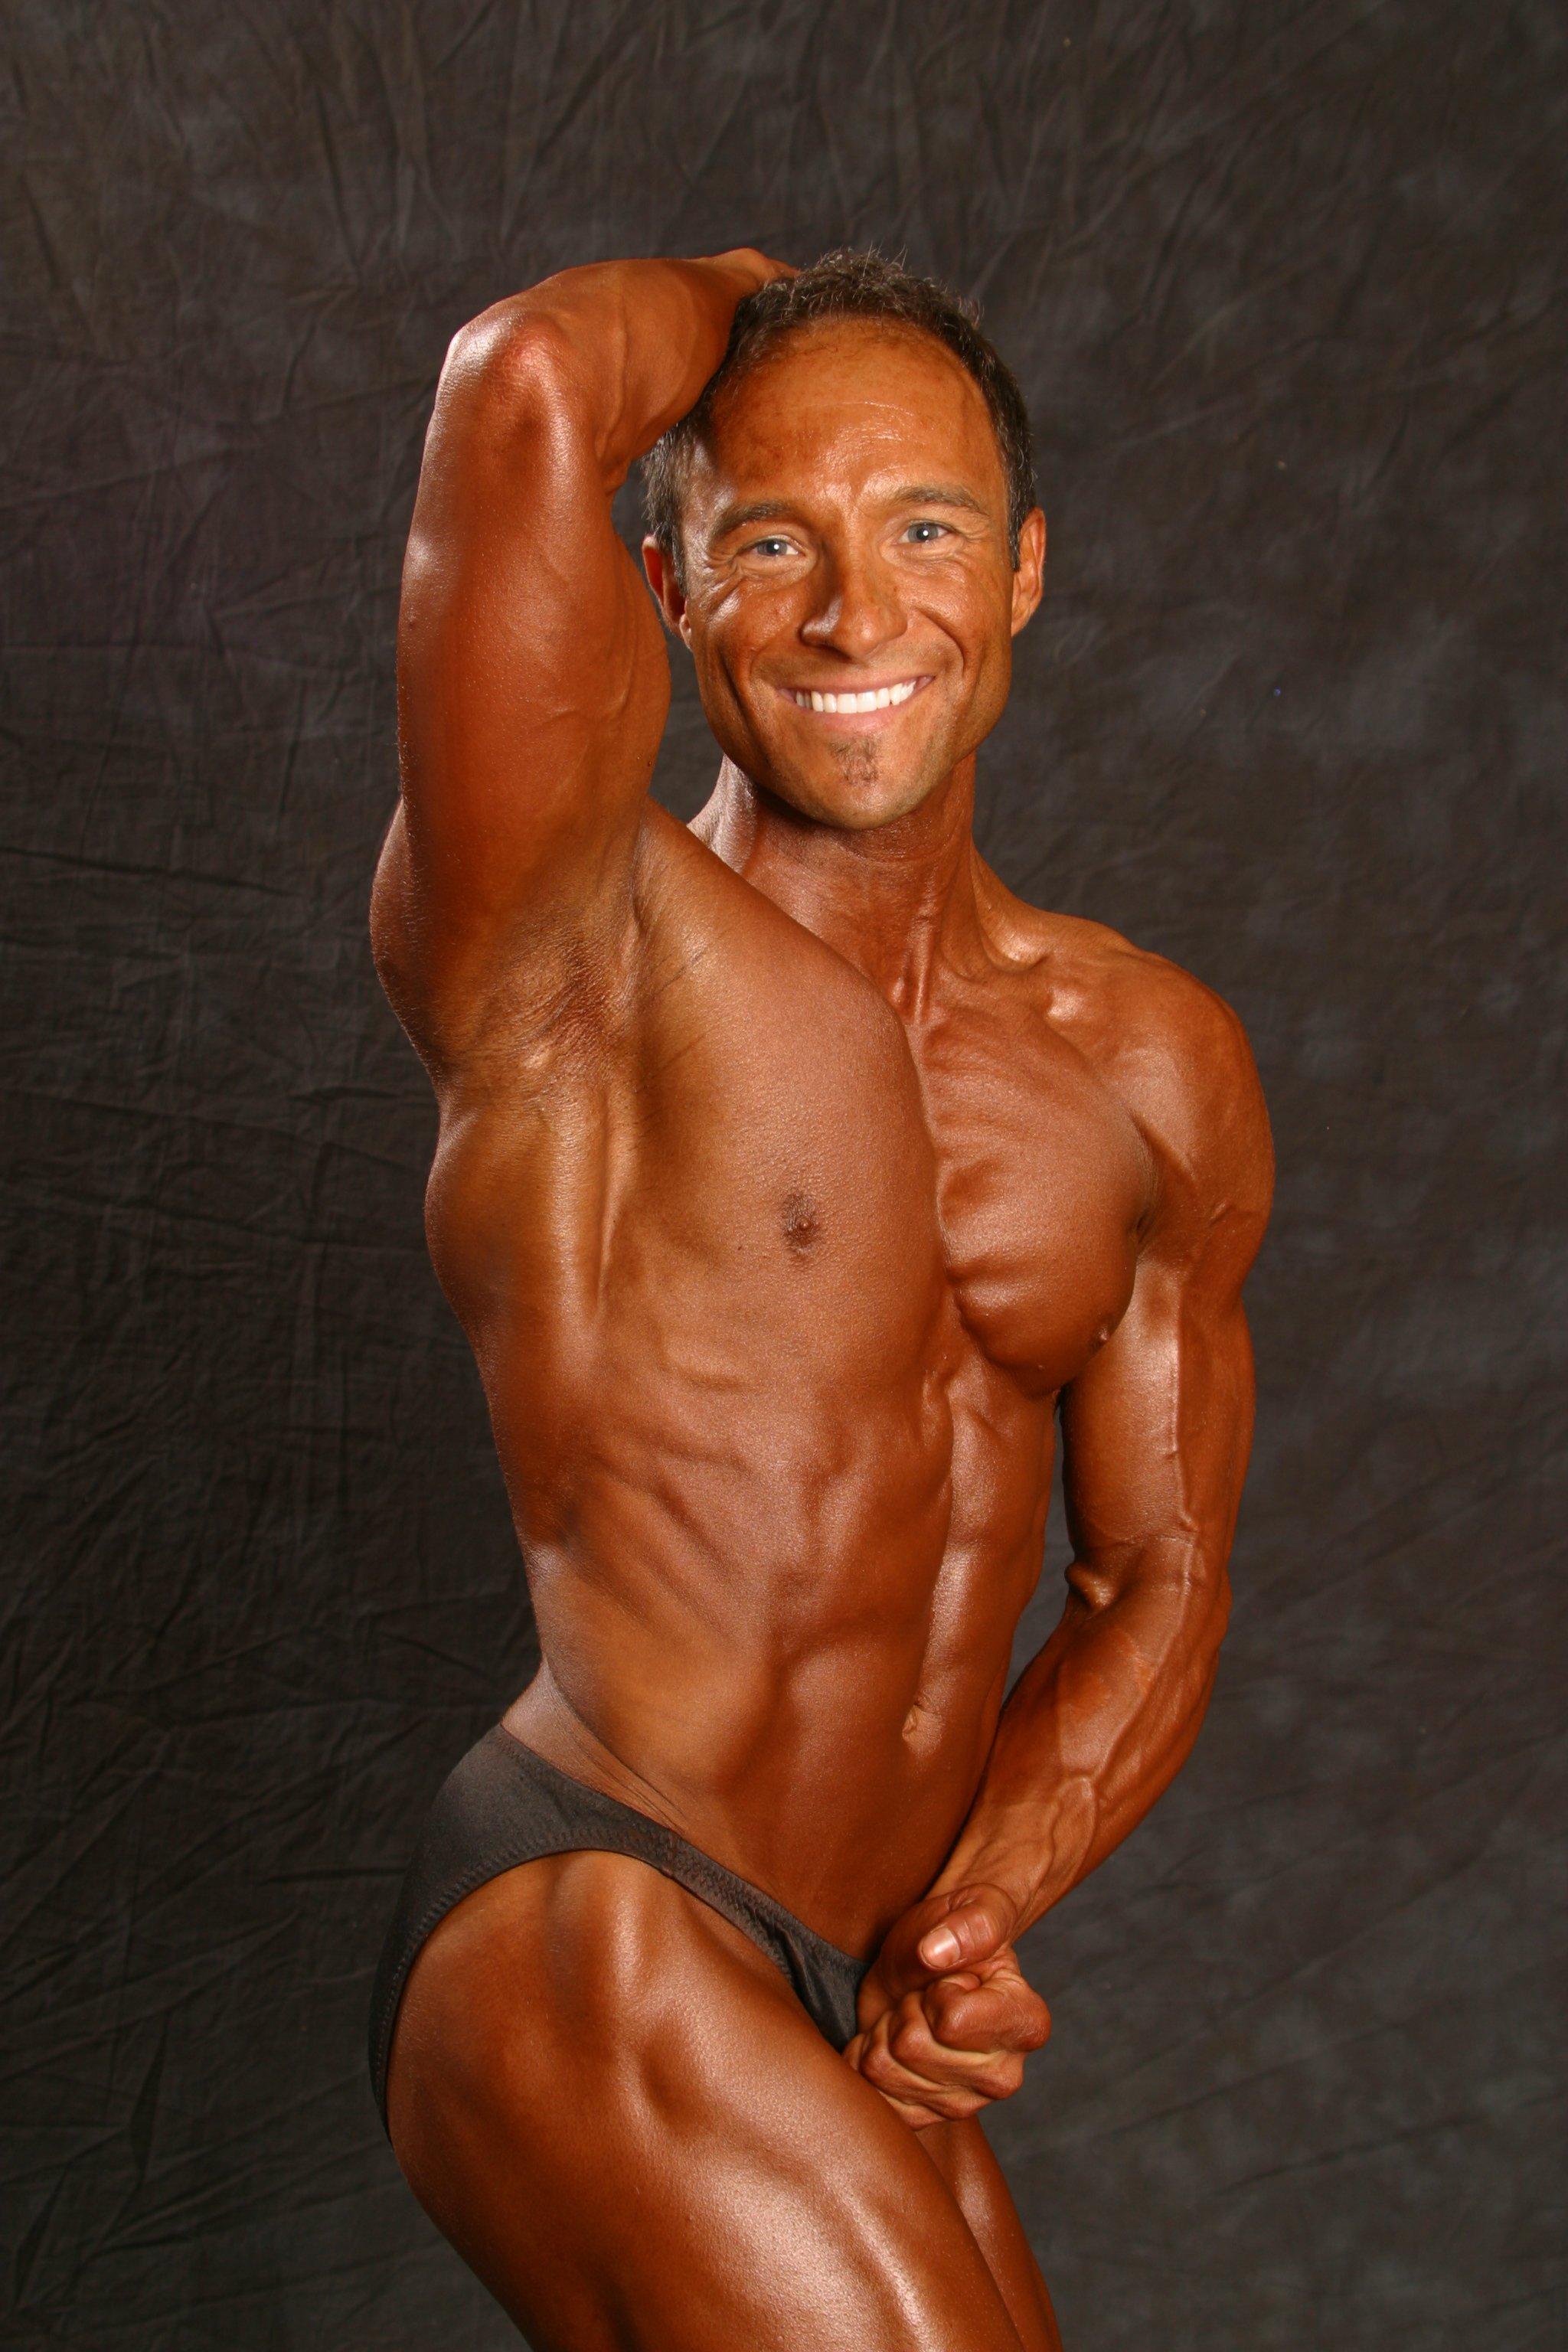 Jim Ribau - Bodybuilding - 2007 06 23 - 12 - Obliques pose